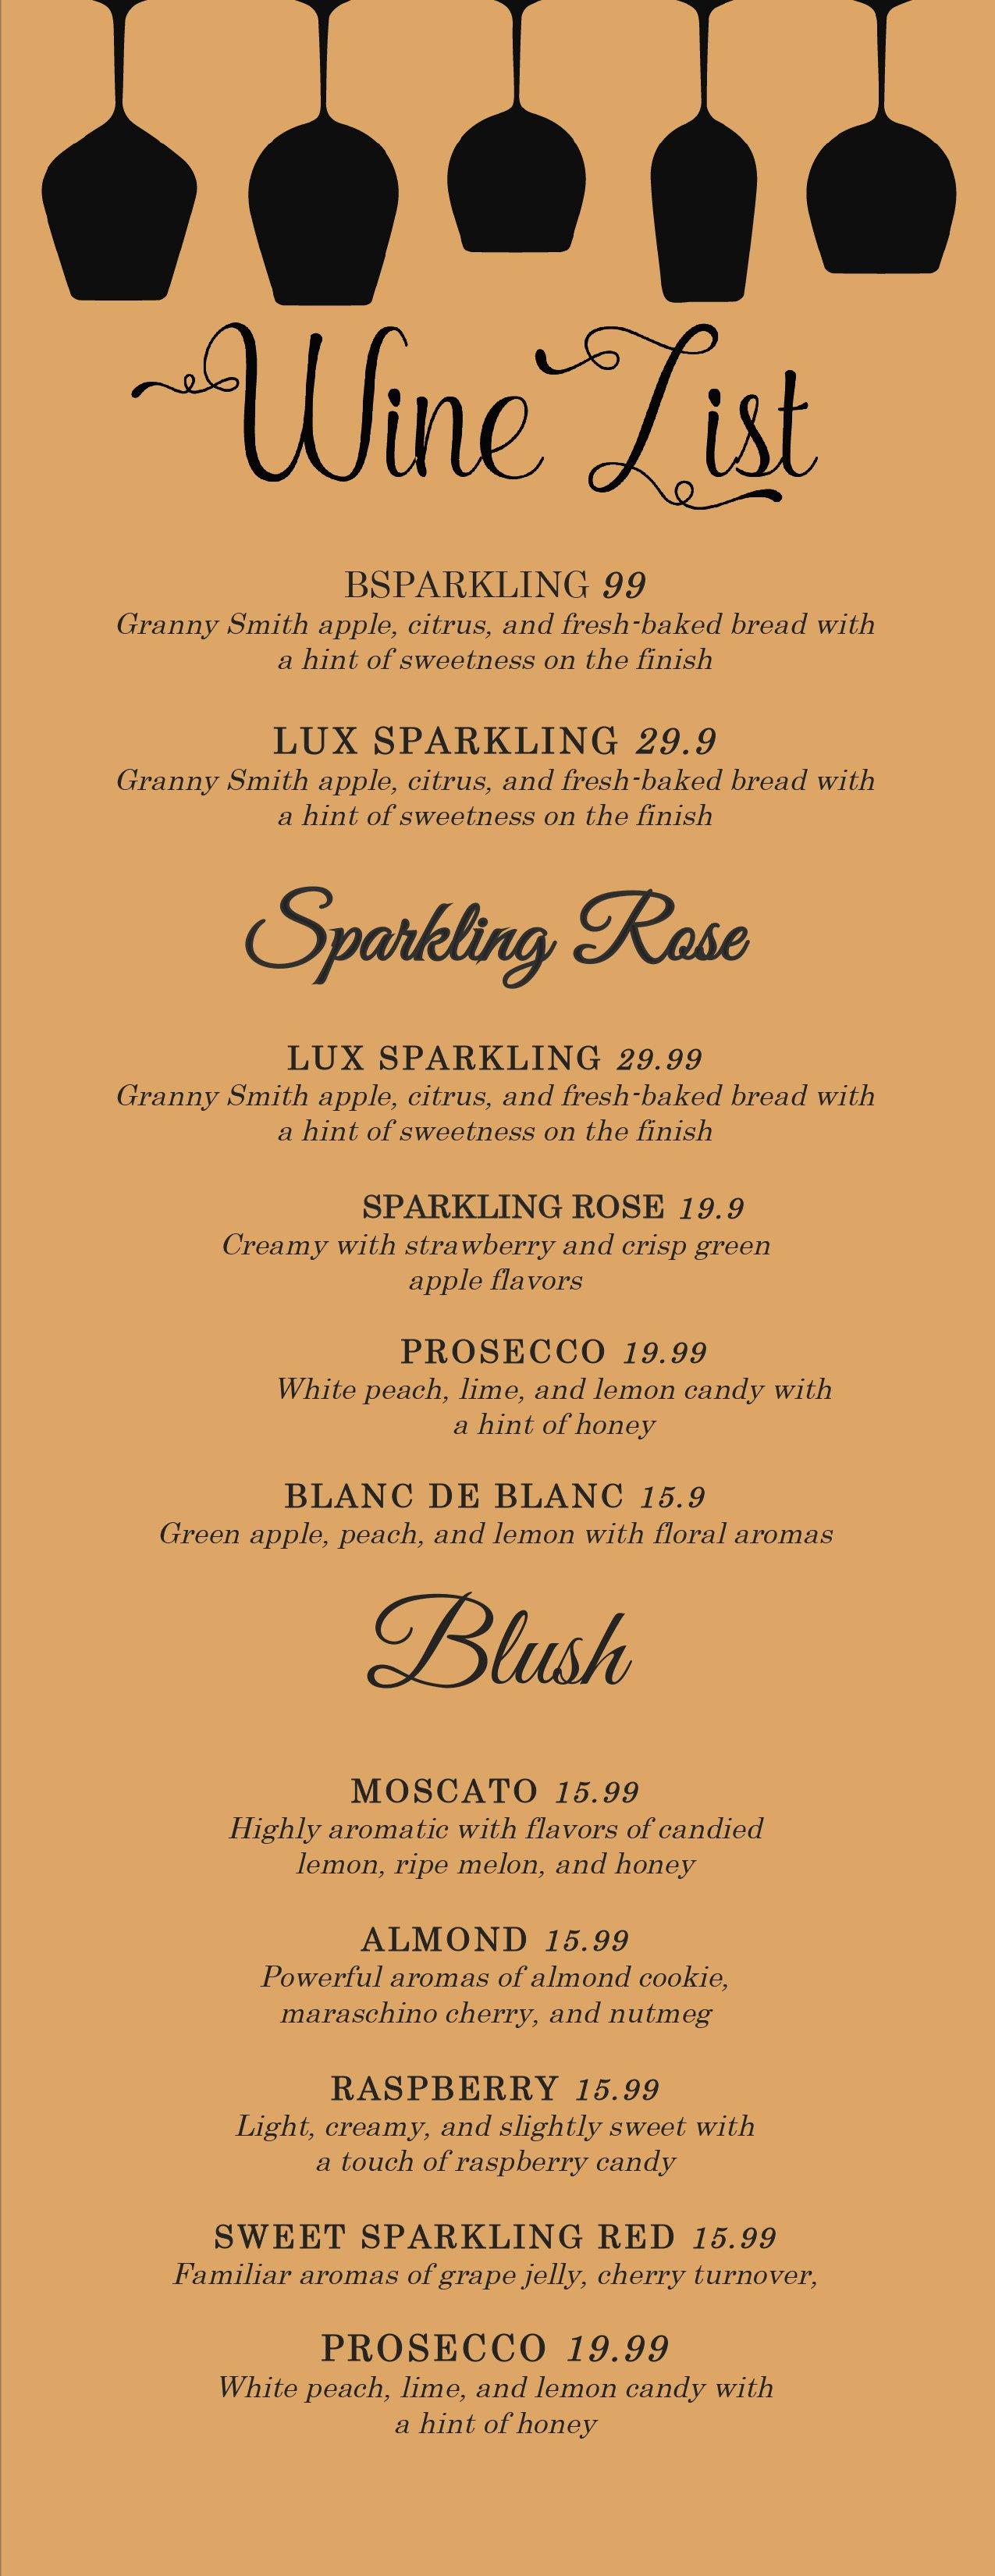 Restaurant Menu Template Word Luxury Design & Templates Menu Templates Wedding Menu Food